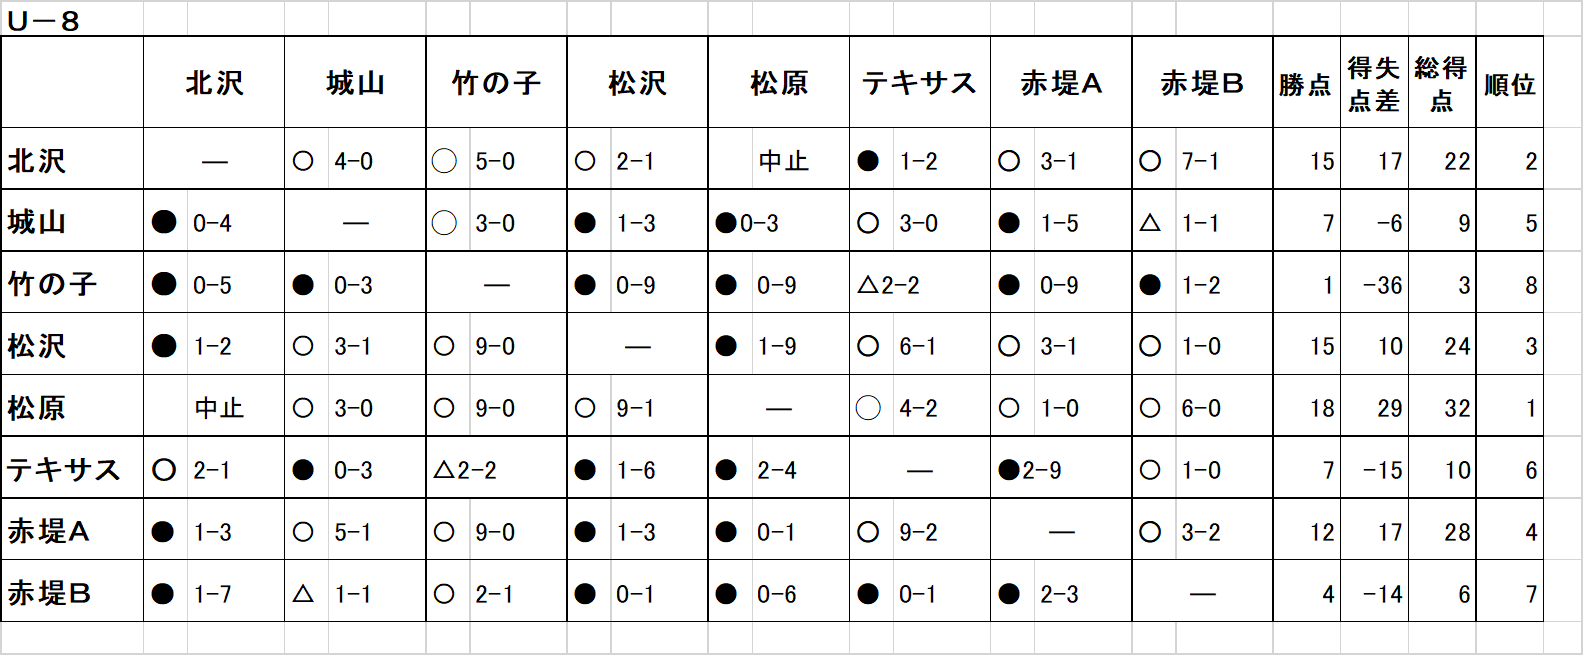 u-8 最終